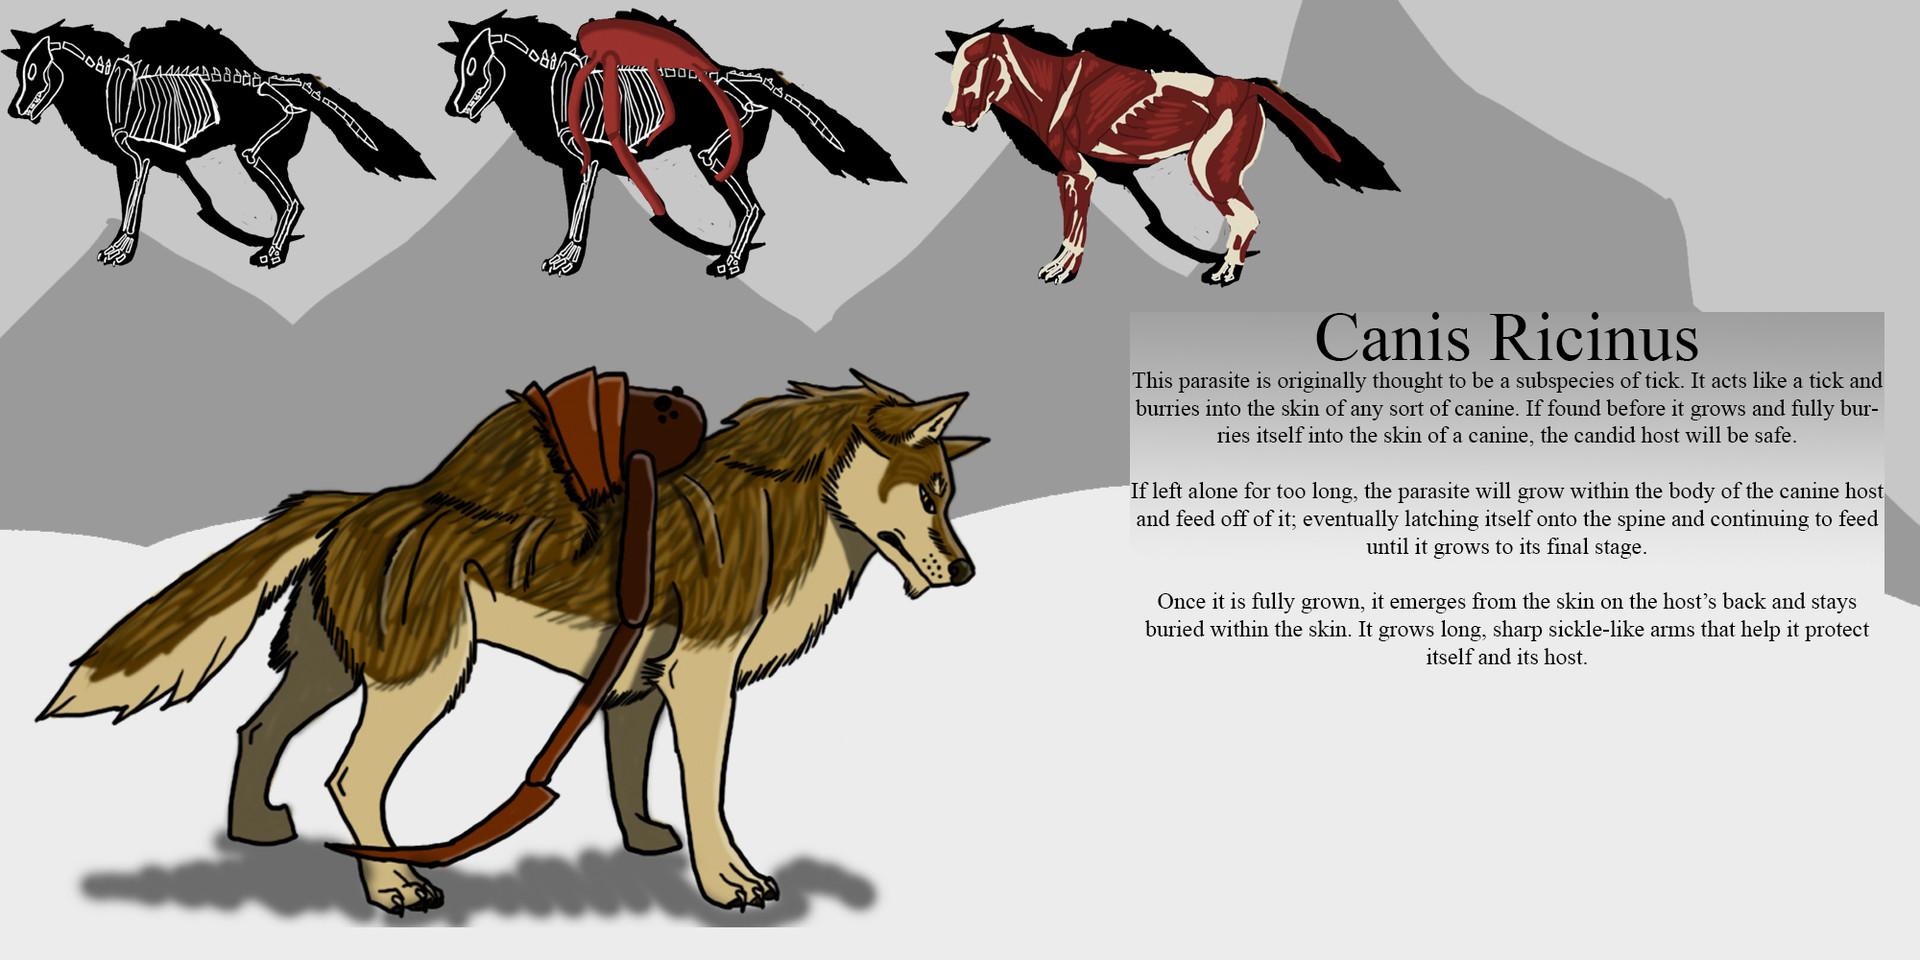 ArtStation - Canis Ricinus, Aliya Jenkins